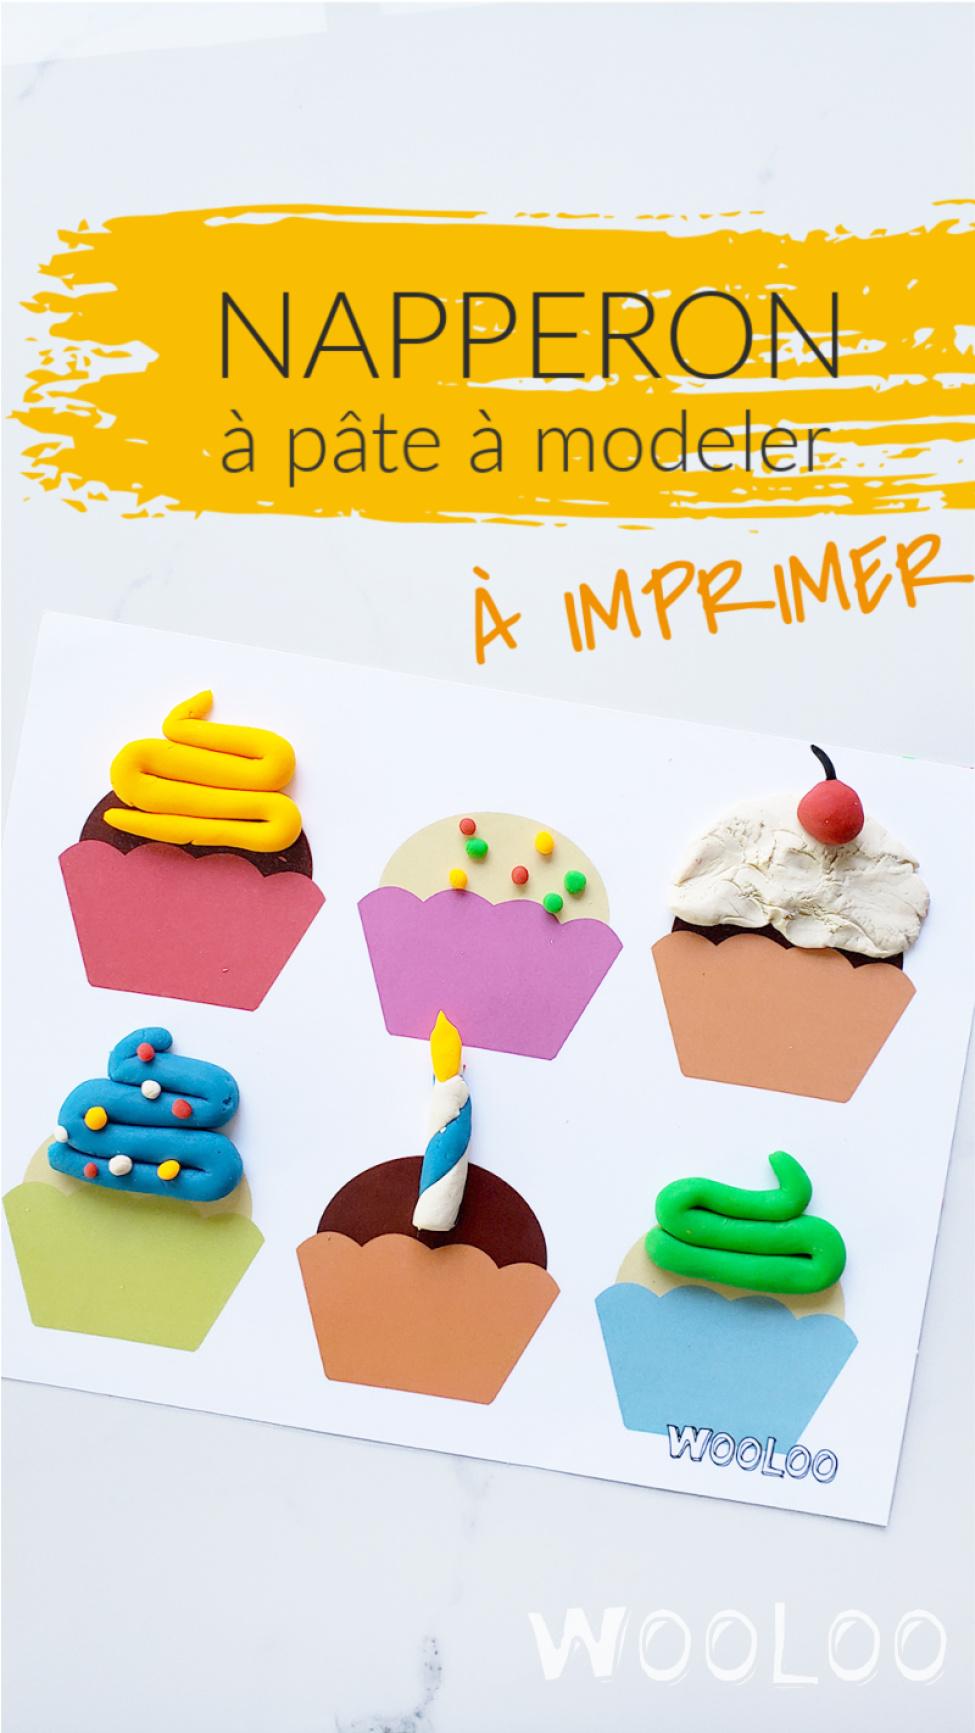 napperon-pate-a-modeler-cupcake- wooloo